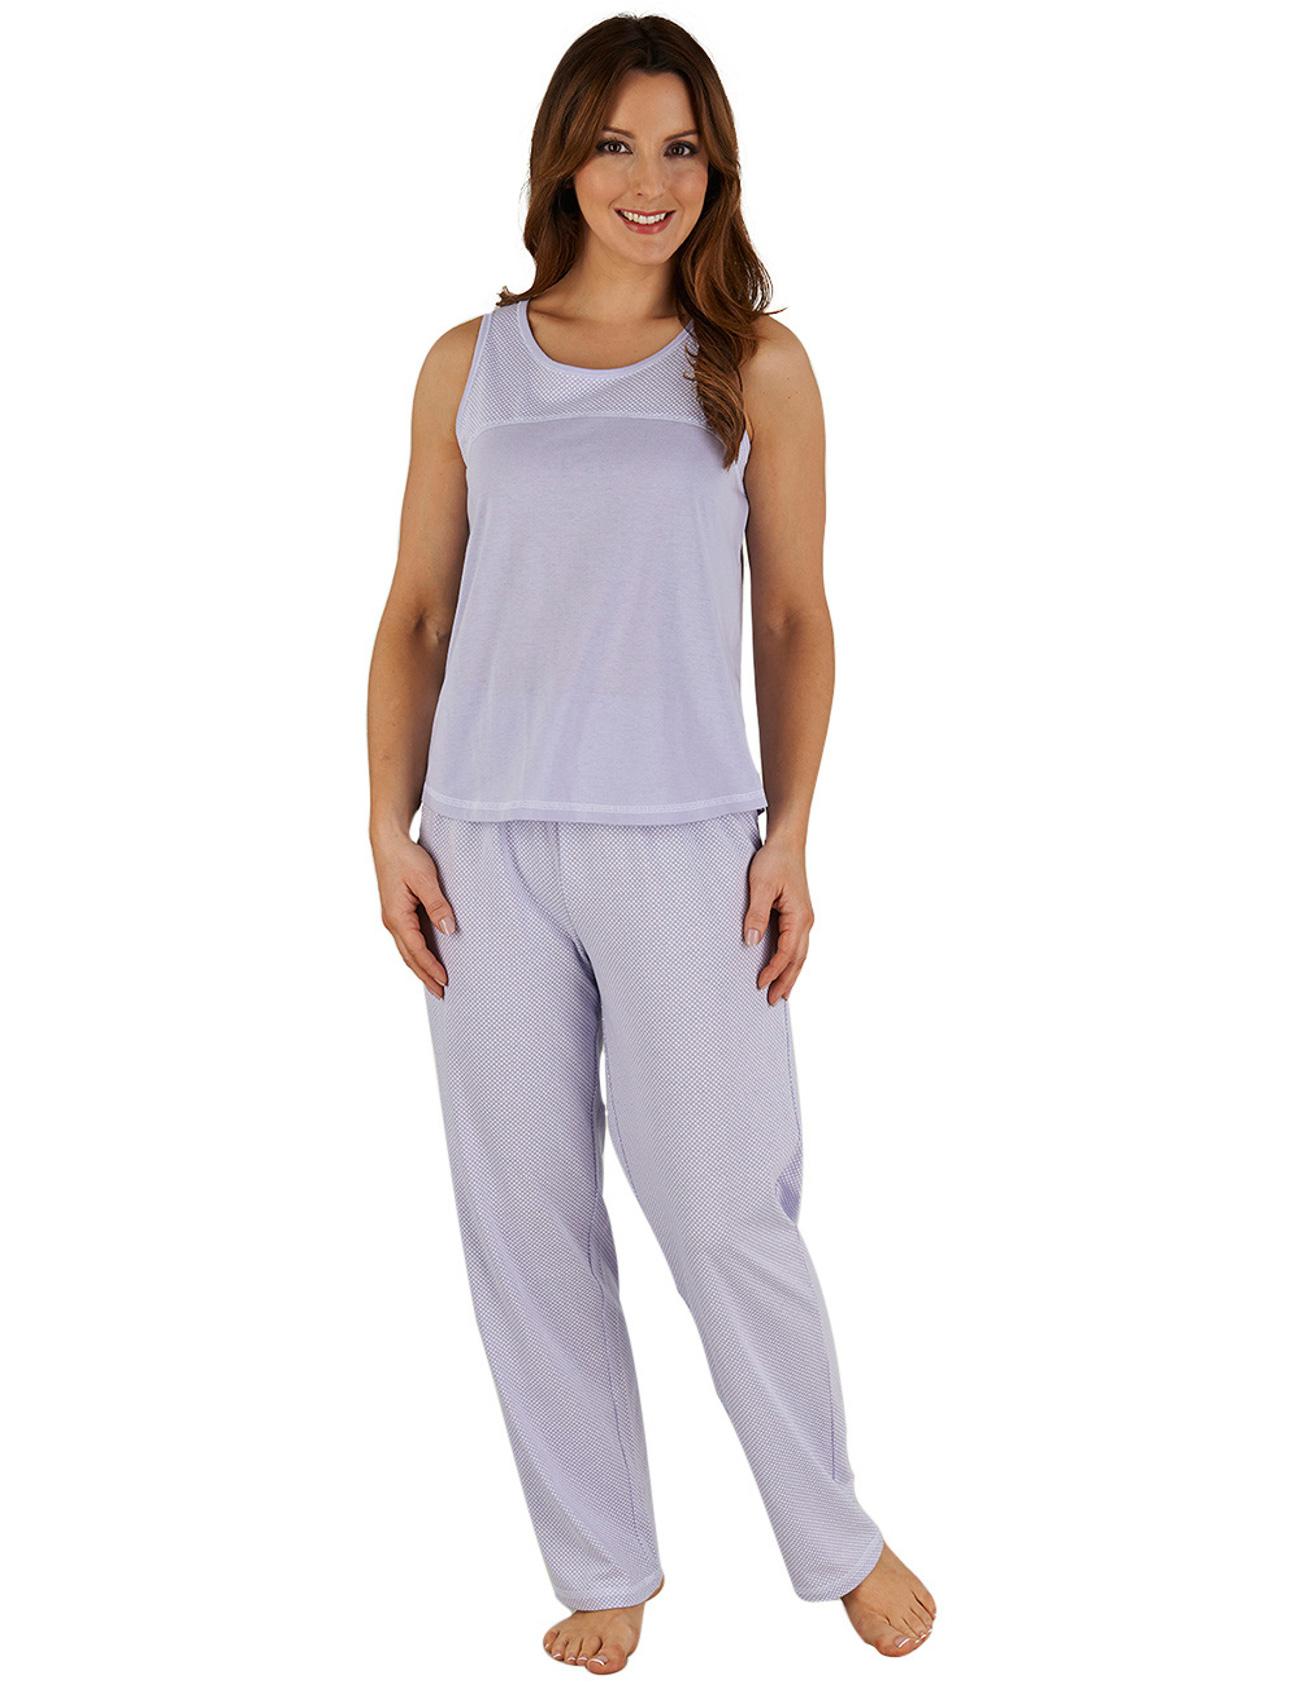 e73e69be0b Spotty Pyjamas Ladies Slenderella Sleeveless Polka Dot PJs Set Top ...